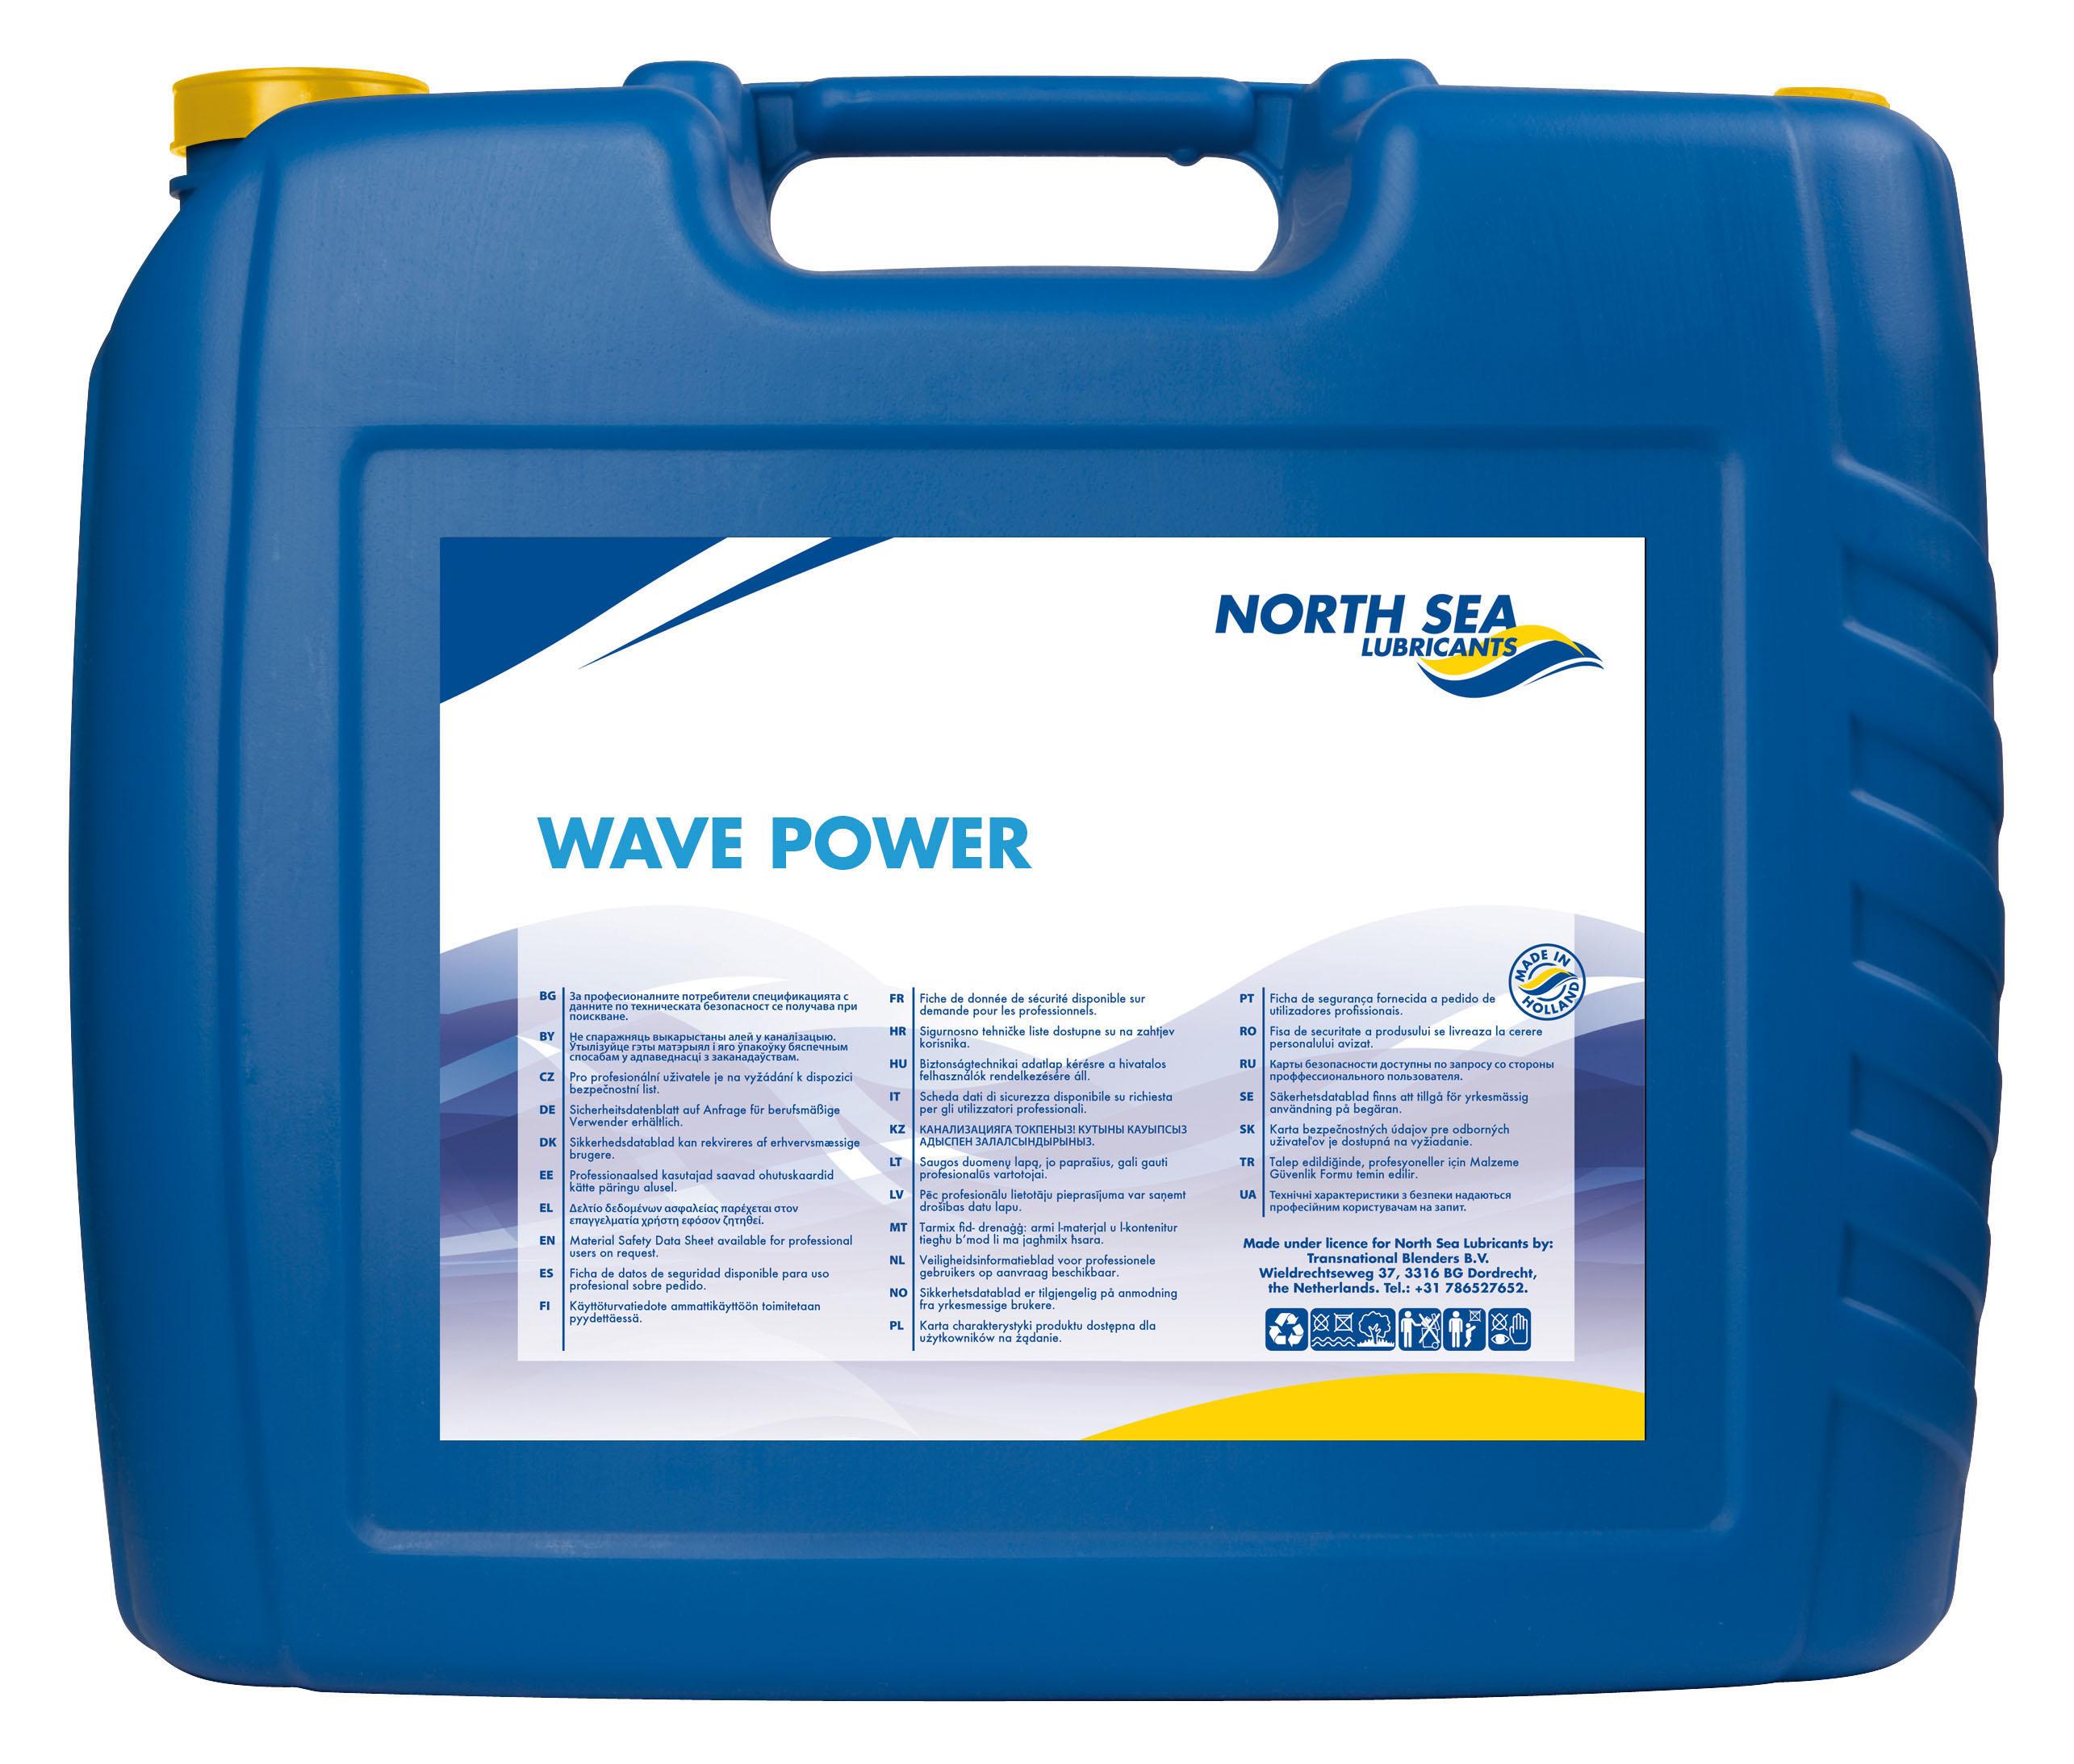 Wave Power Le 5w 30 North Sea Lubricants